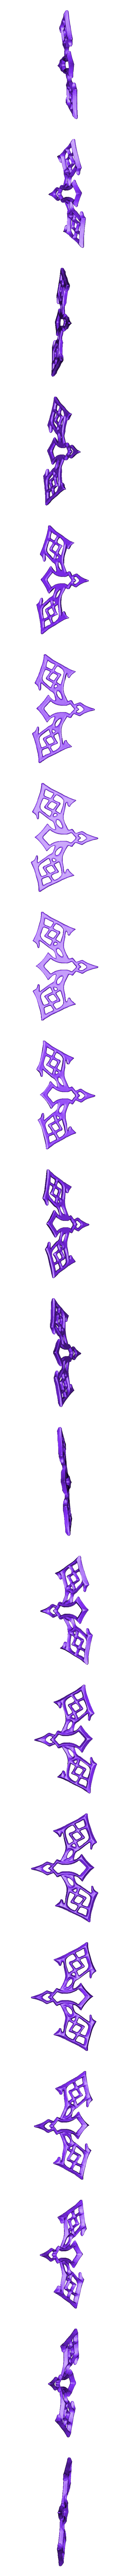 h1.stl Download free STL file SINoALICE composite, printable • 3D printable model, HARZLabs